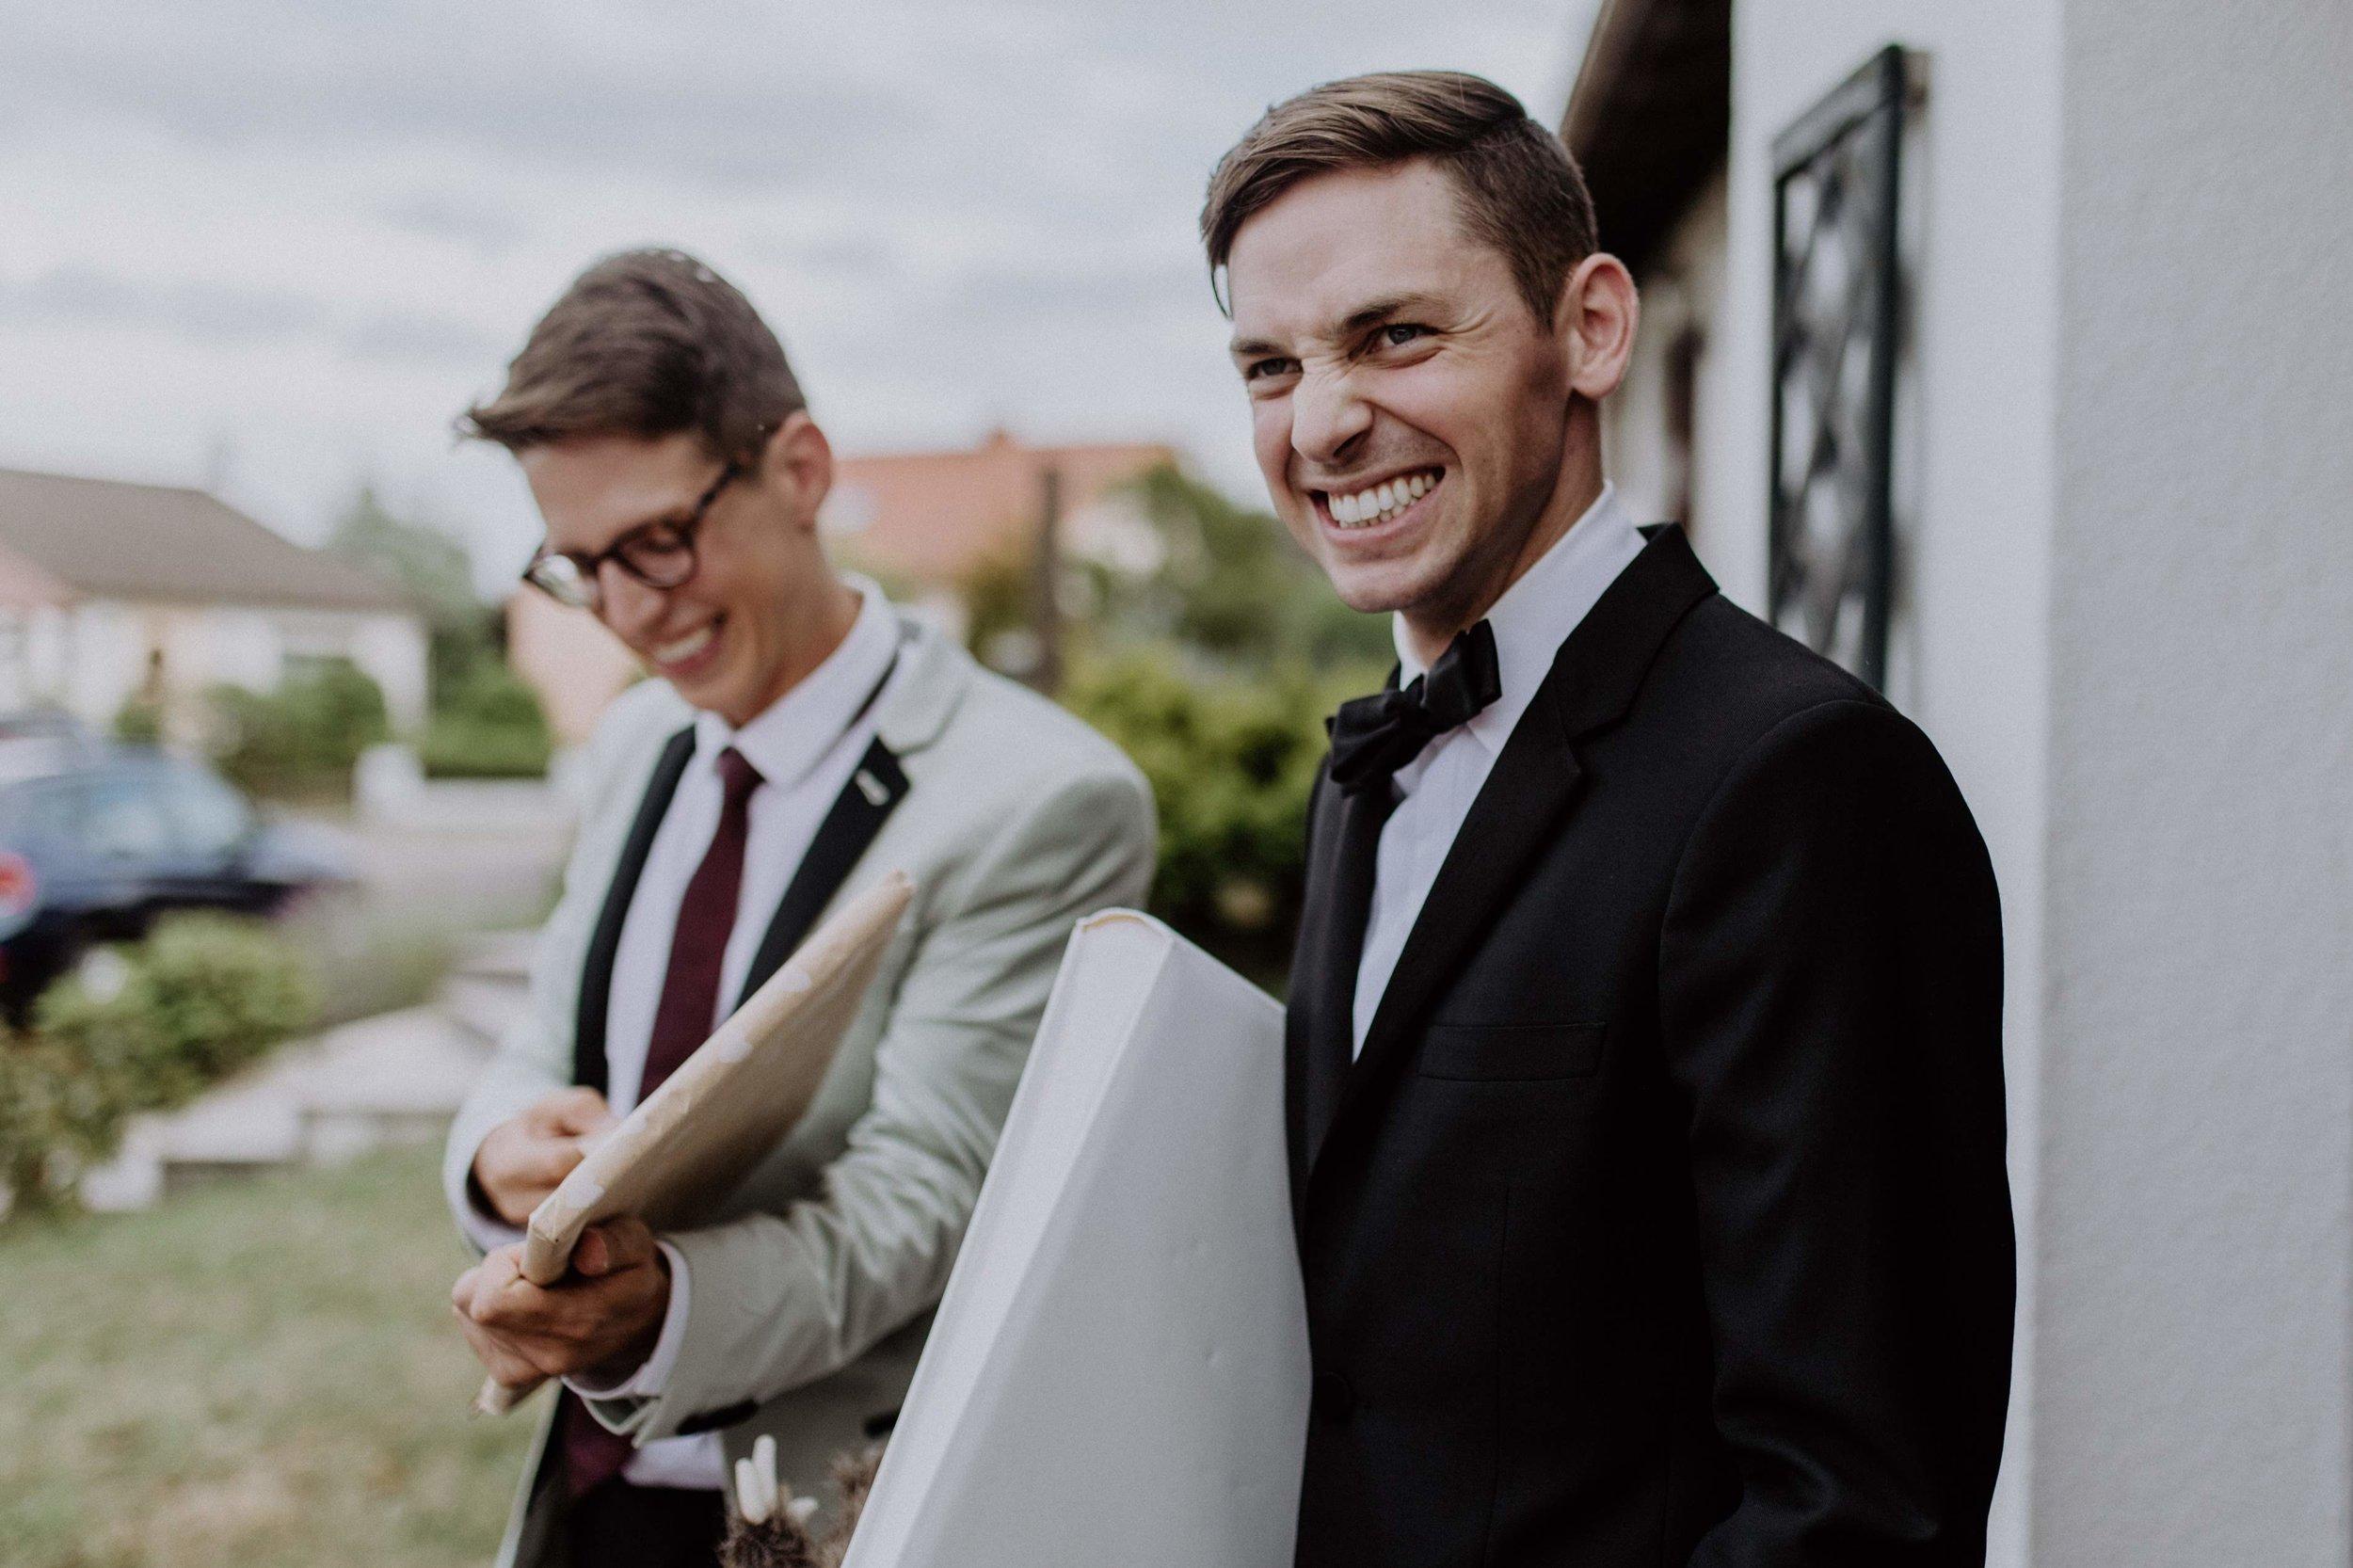 mr theodore-same-sex wedding_melbourne wedding directory21.jpg